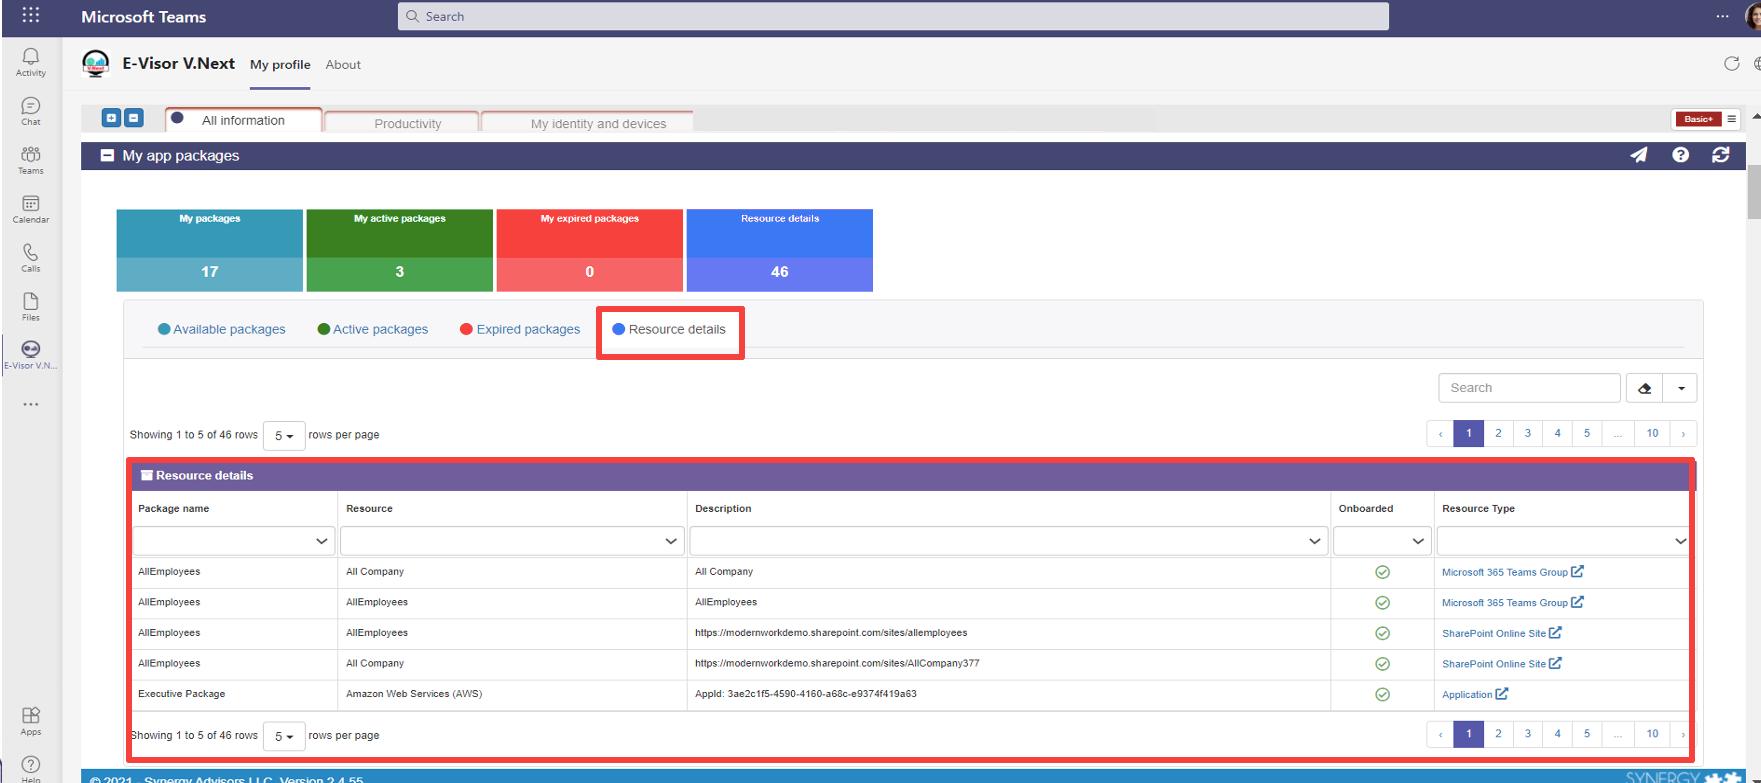 User resource details